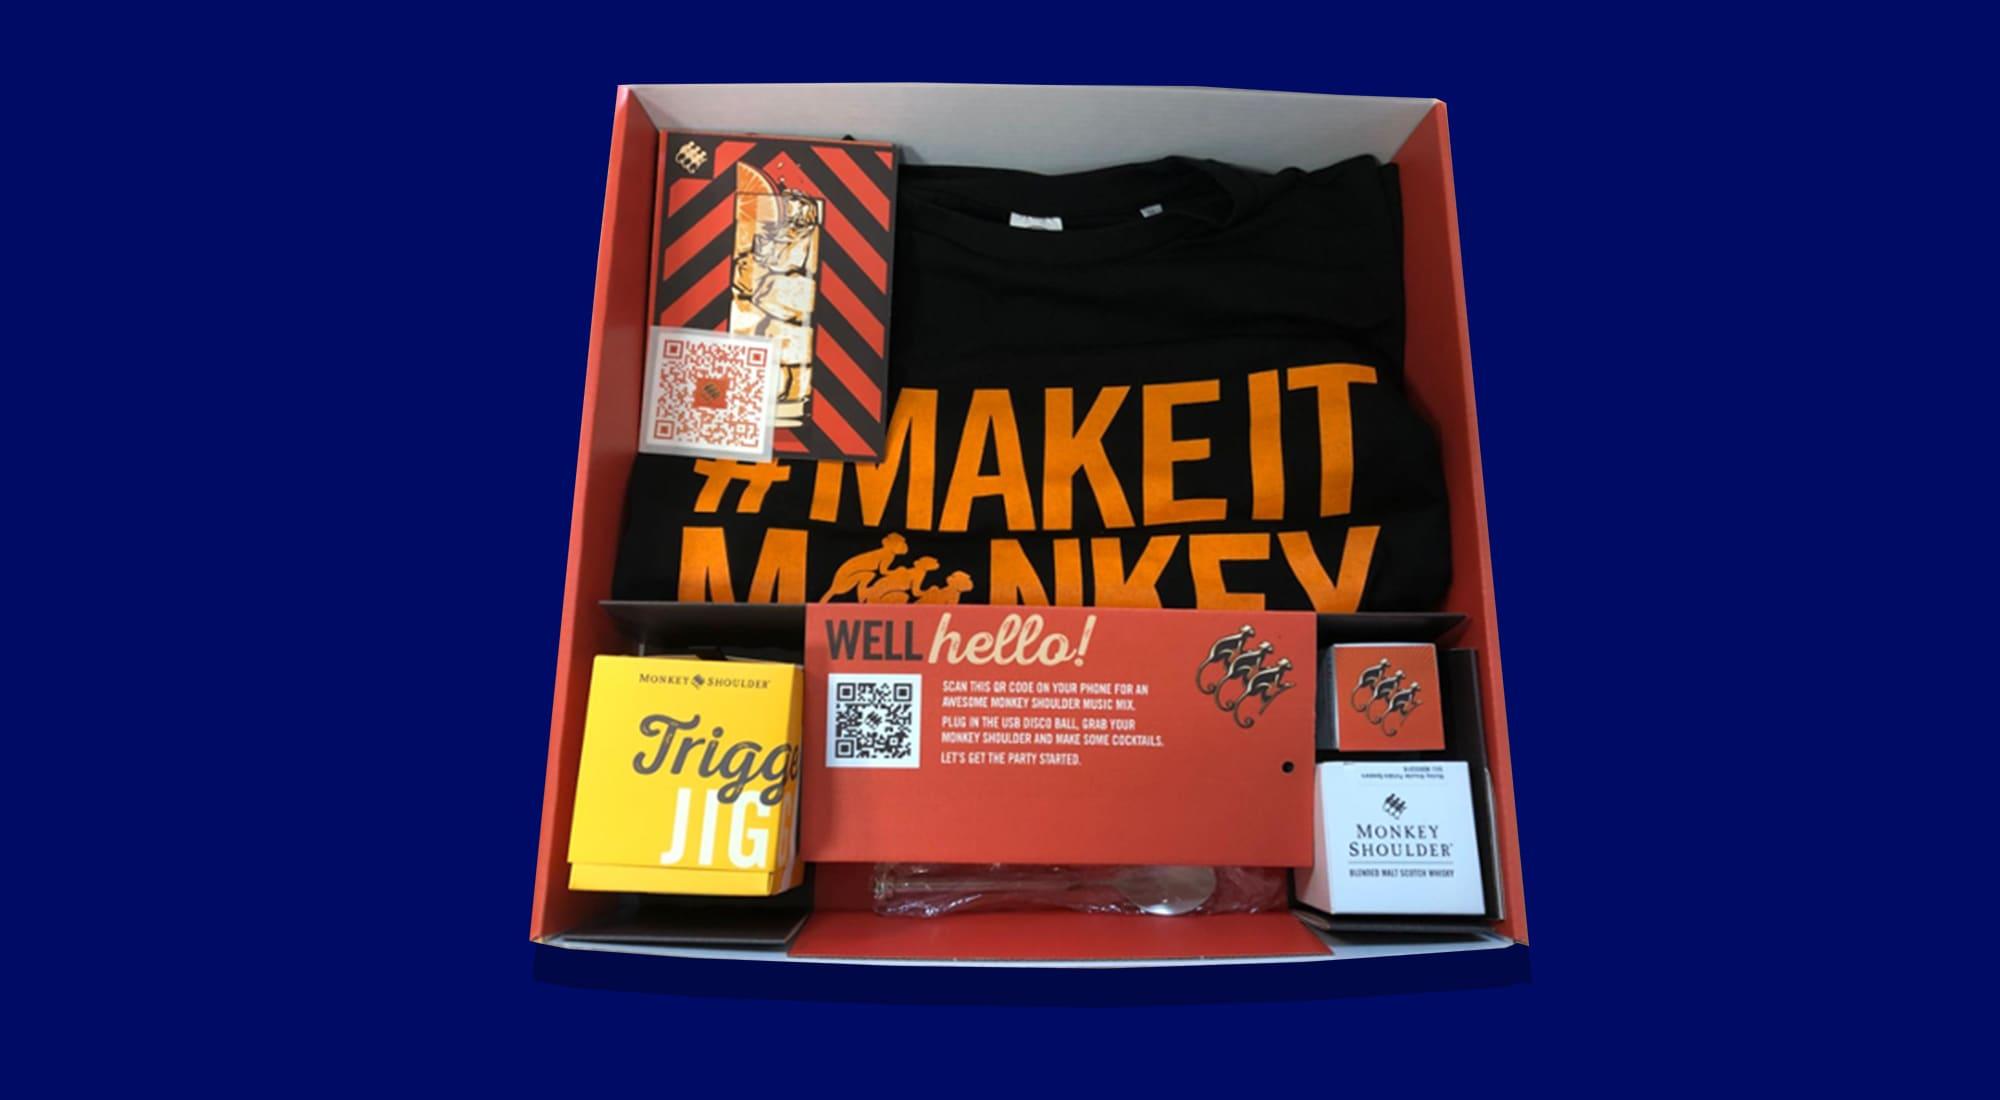 Monkey Shoulder live gift box contents